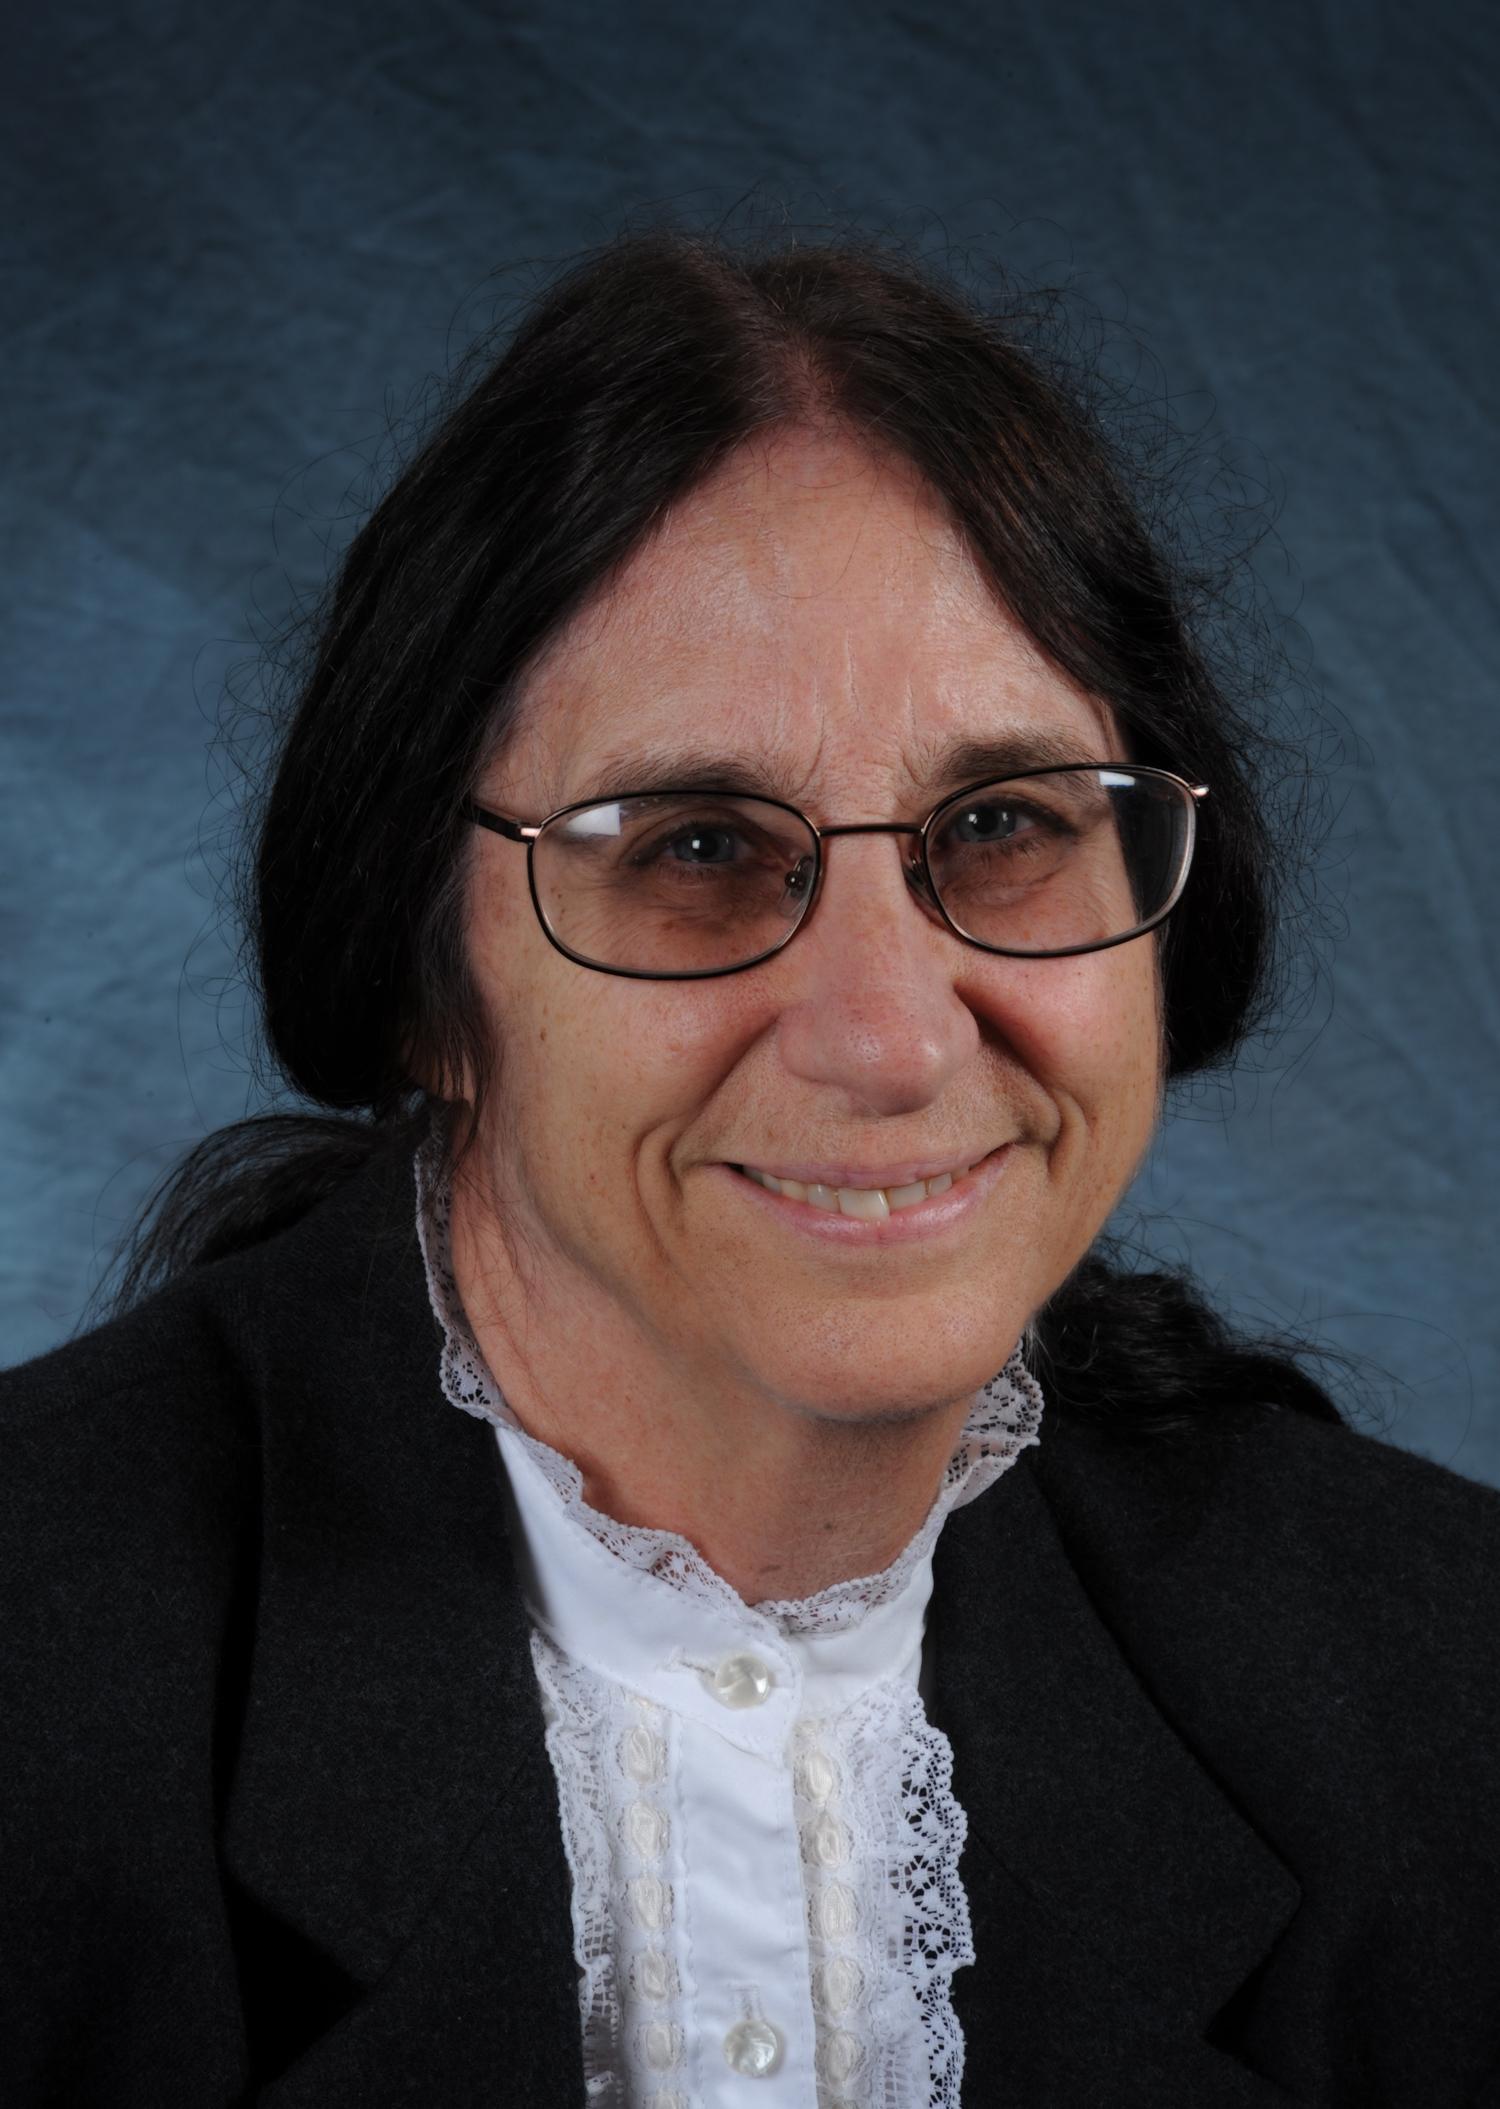 Linda Spremulli